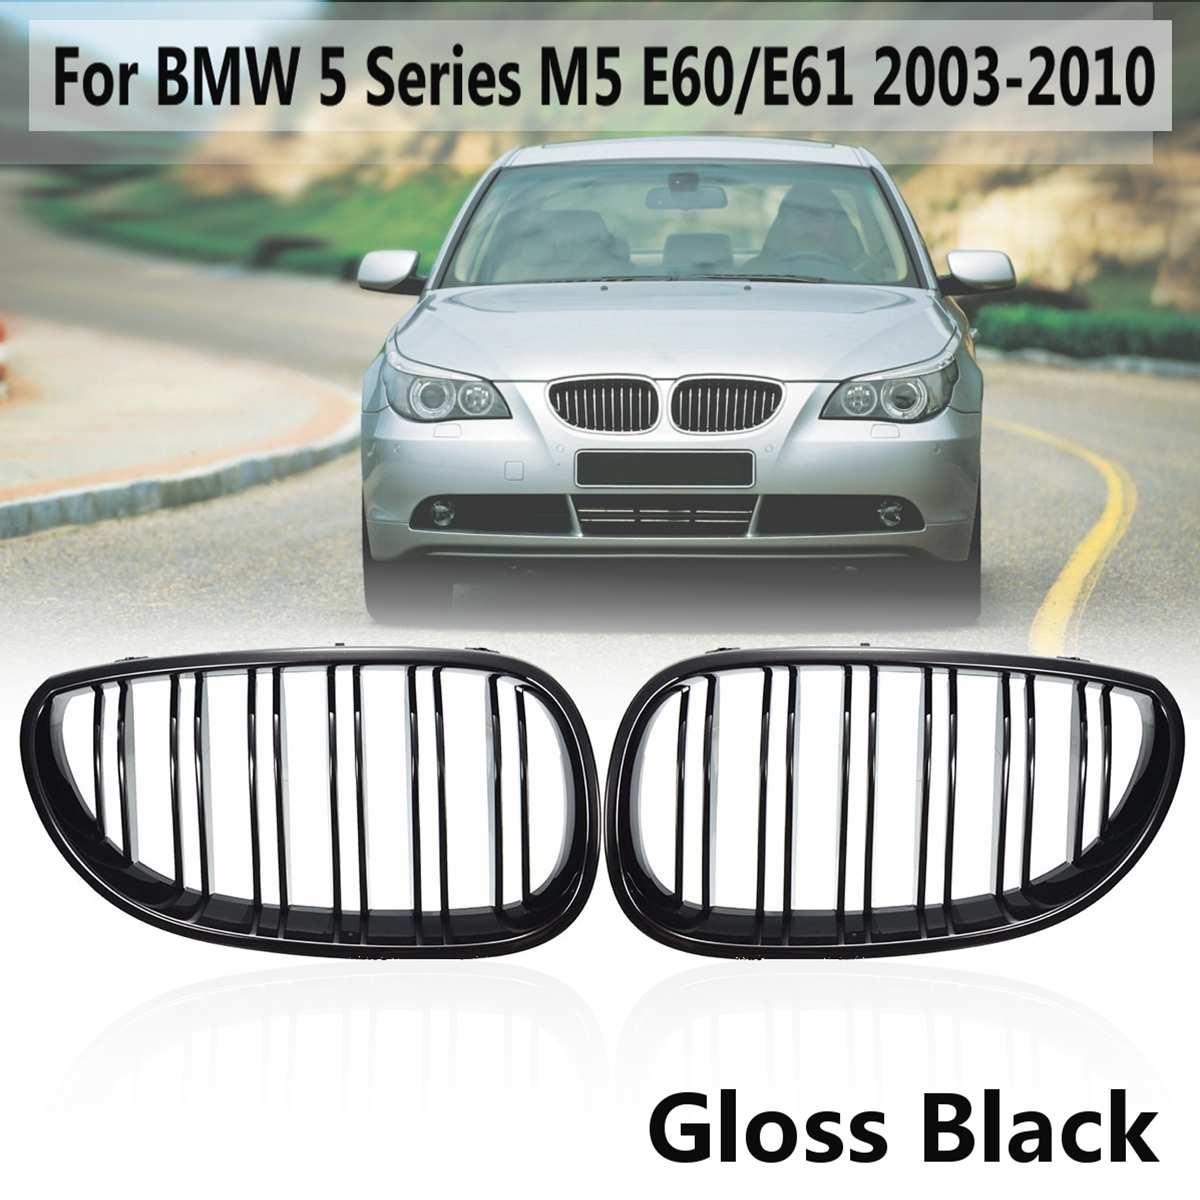 Araba ön spor izgara böbrek Grilles Grill için BMW 5 serisi M5 E60/E61 2003 2004 2005 2006 2007 2008 2009 2010 parlak siyah